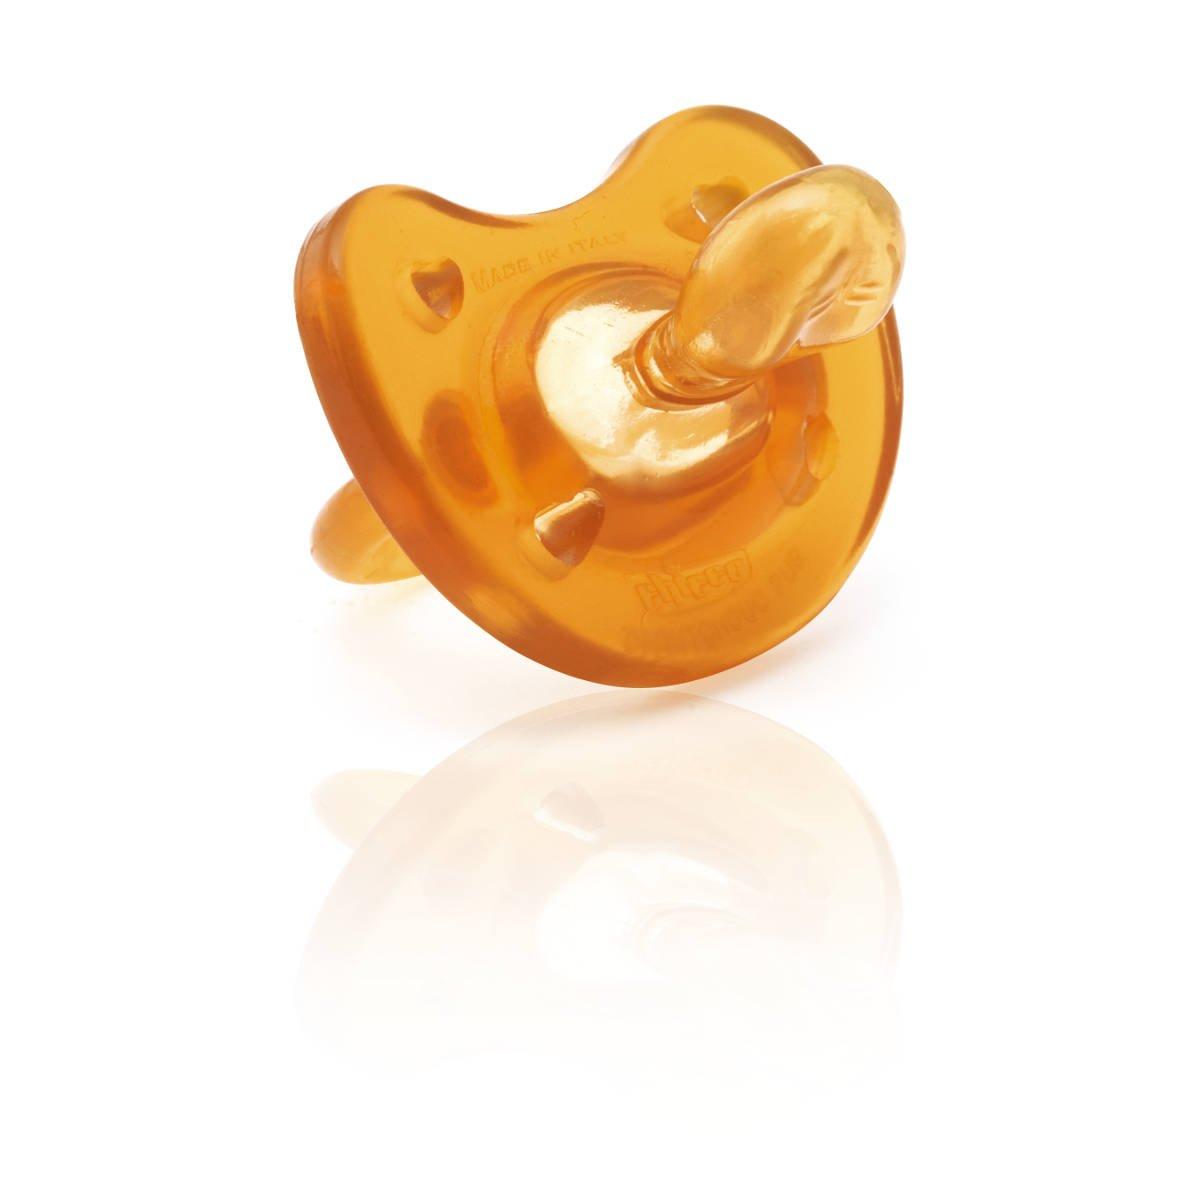 Chicco Todogoma Physio Soft - Chupete de caucho para bebé, 0-4 meses, color marron